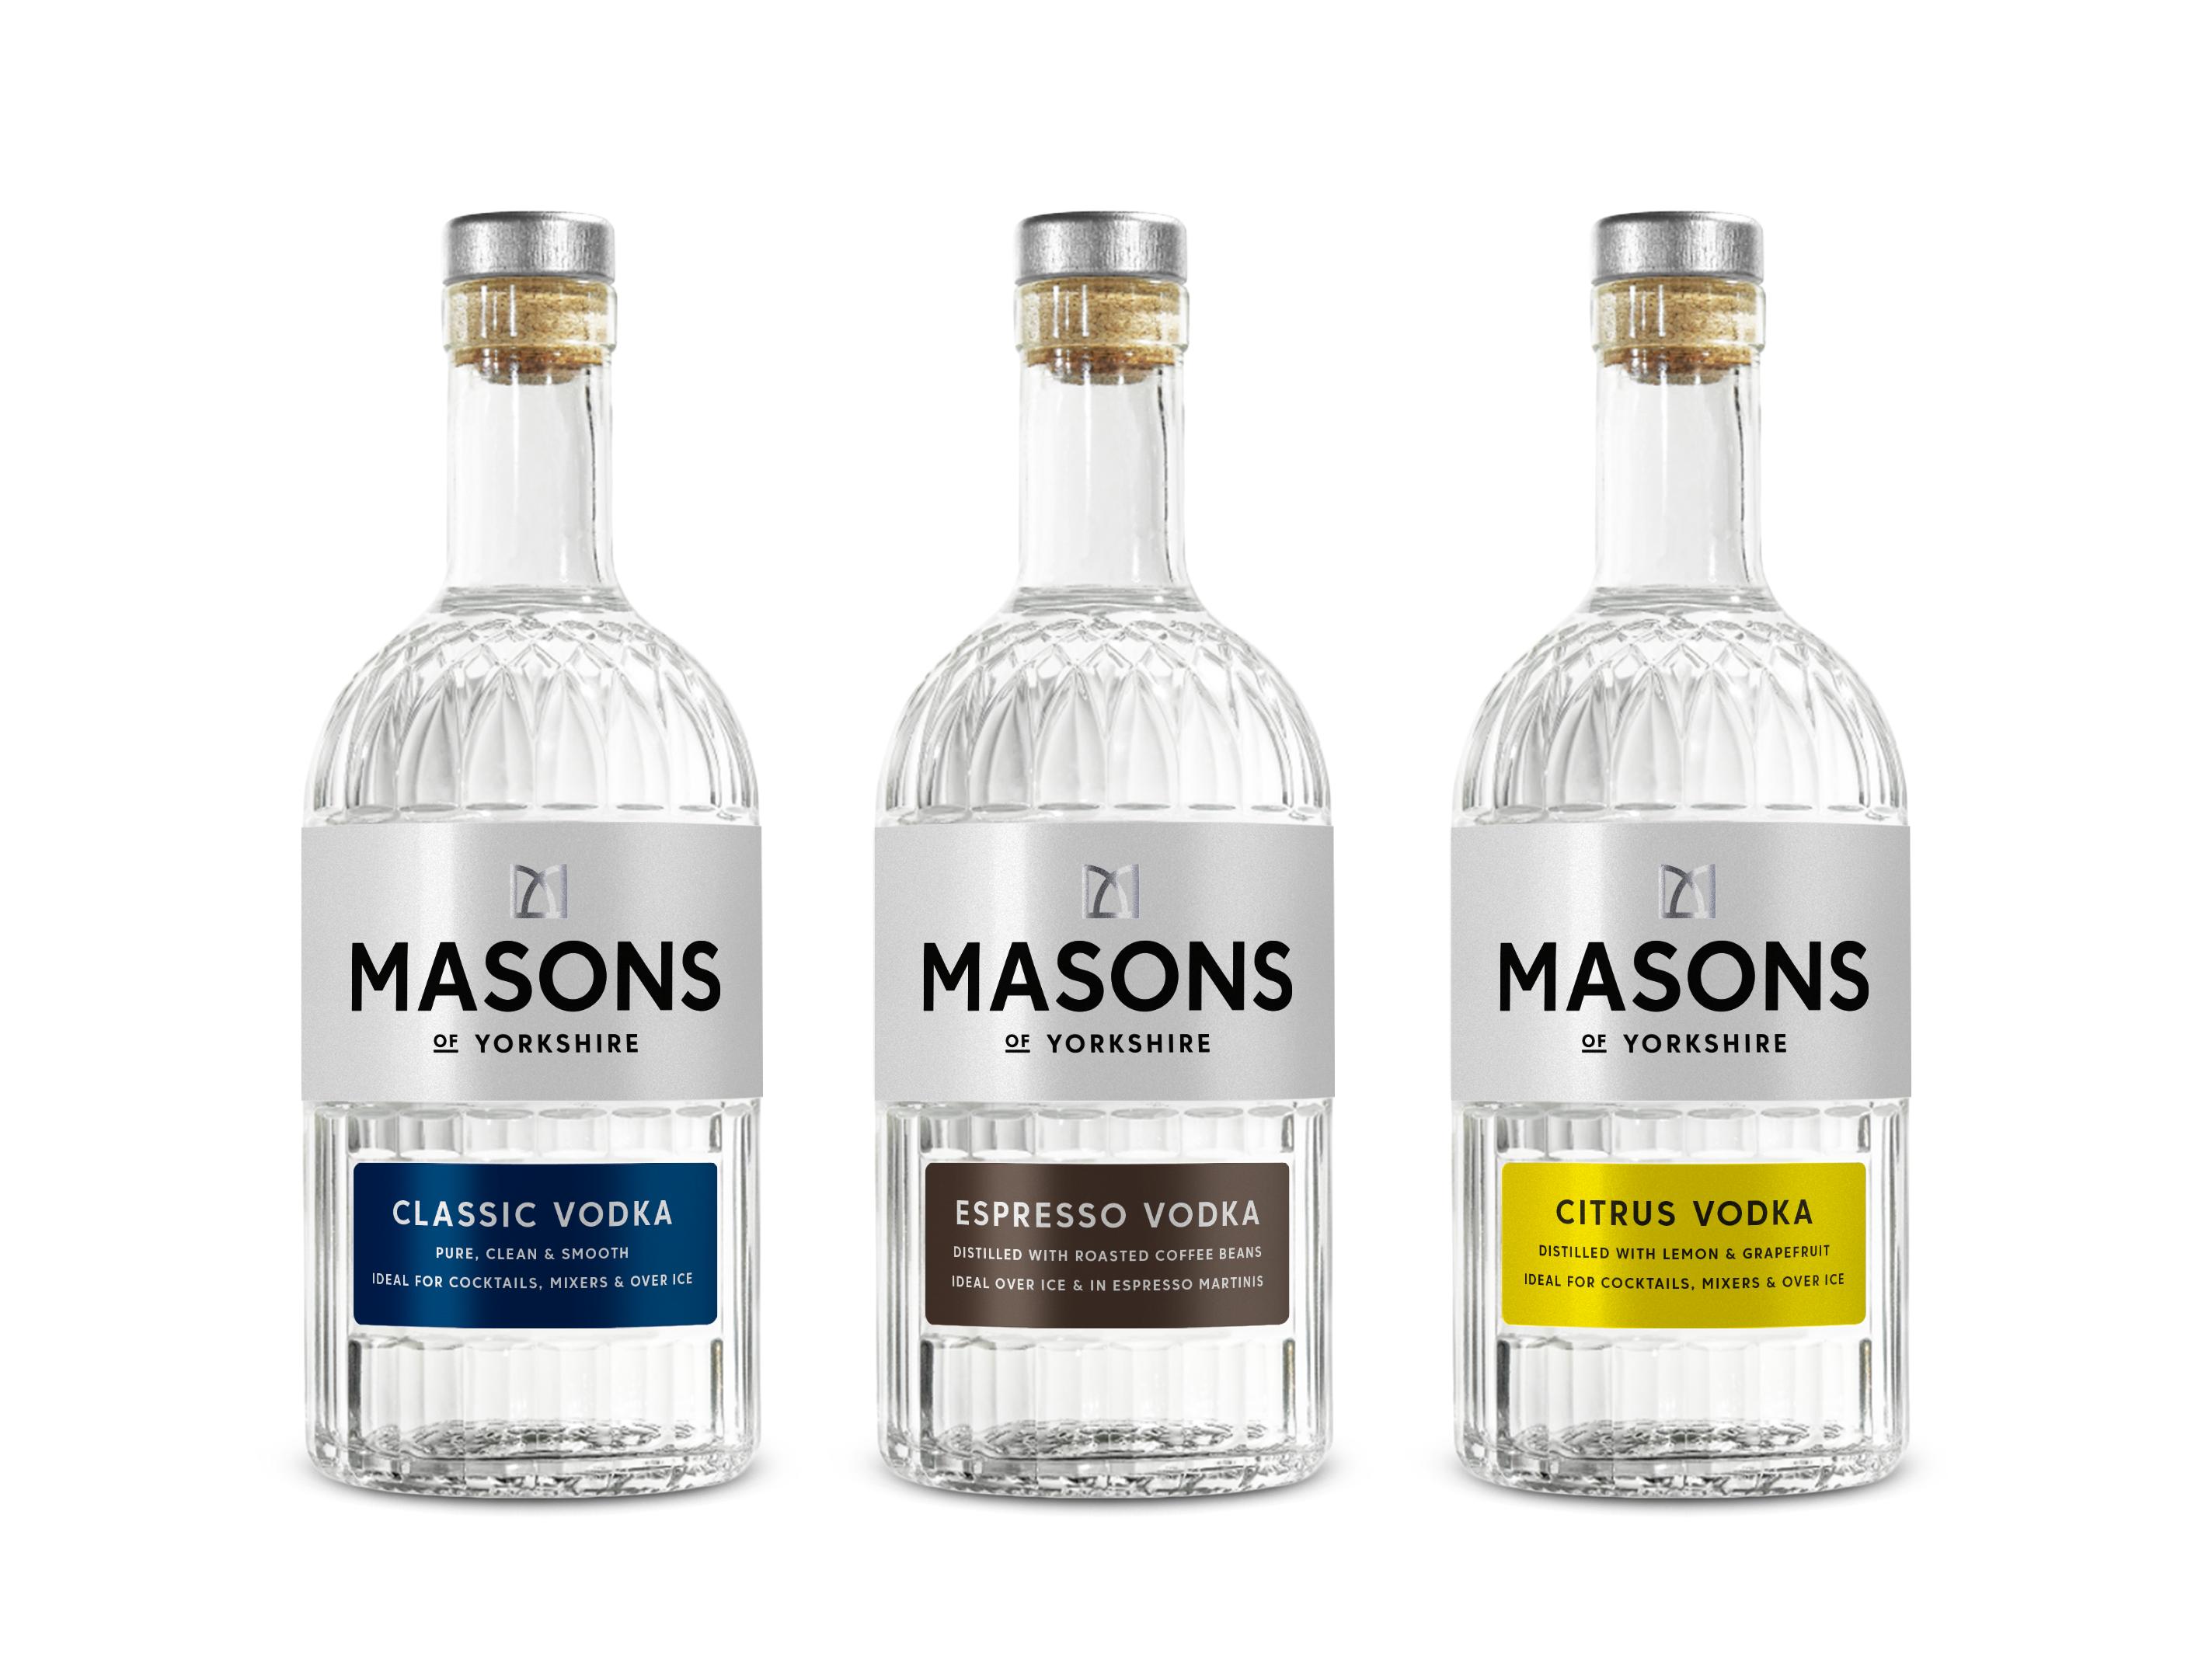 Masons of Yorkshire Classic, Espresso and Citrus Vodkas